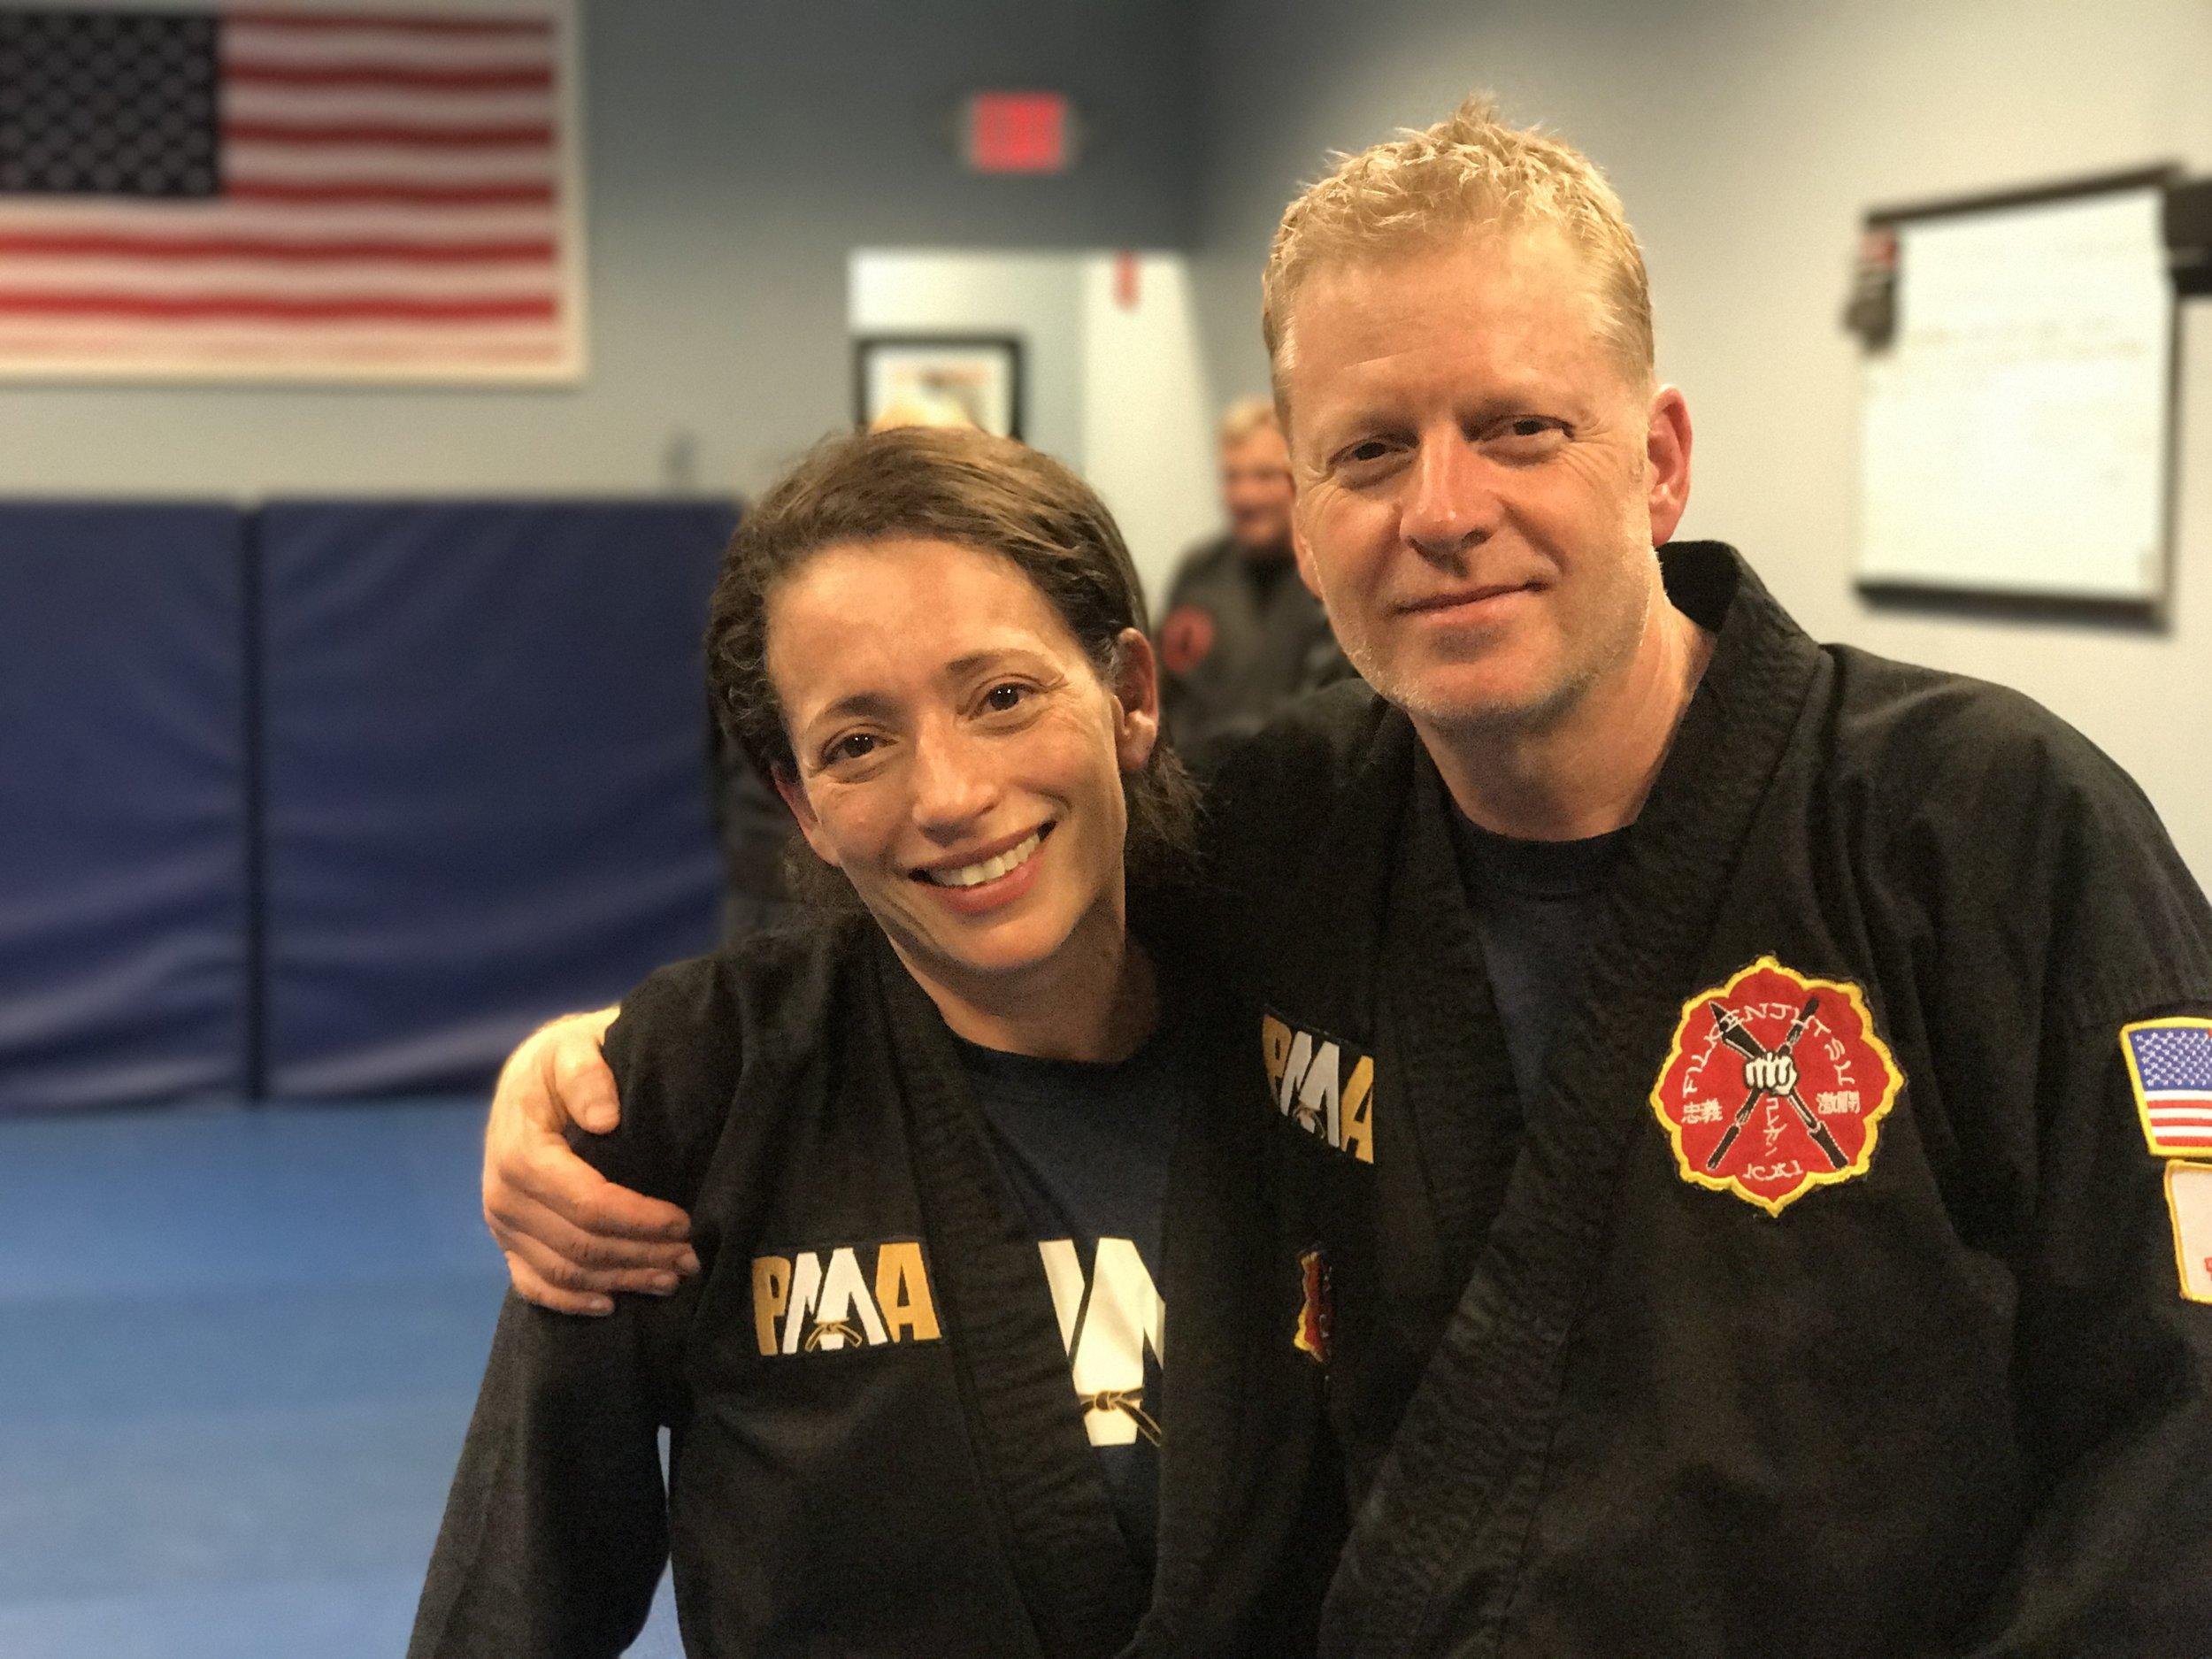 FILKENJUTSU KAI's most recent Black Belt candidates, Gary Hall and Linda Davis.